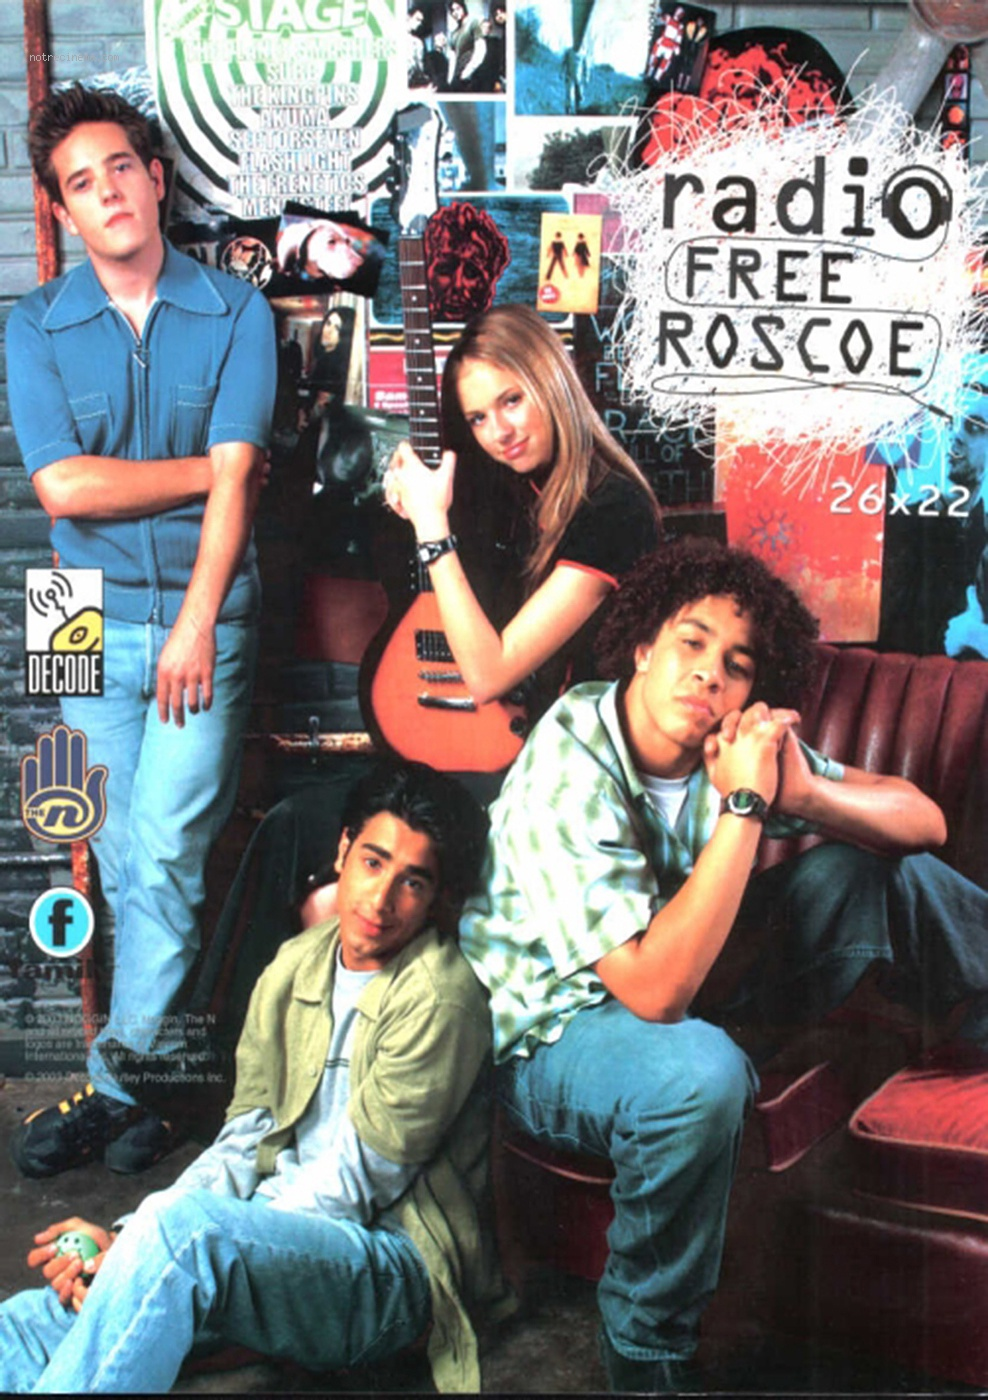 Radio Free Roscoe (2003)